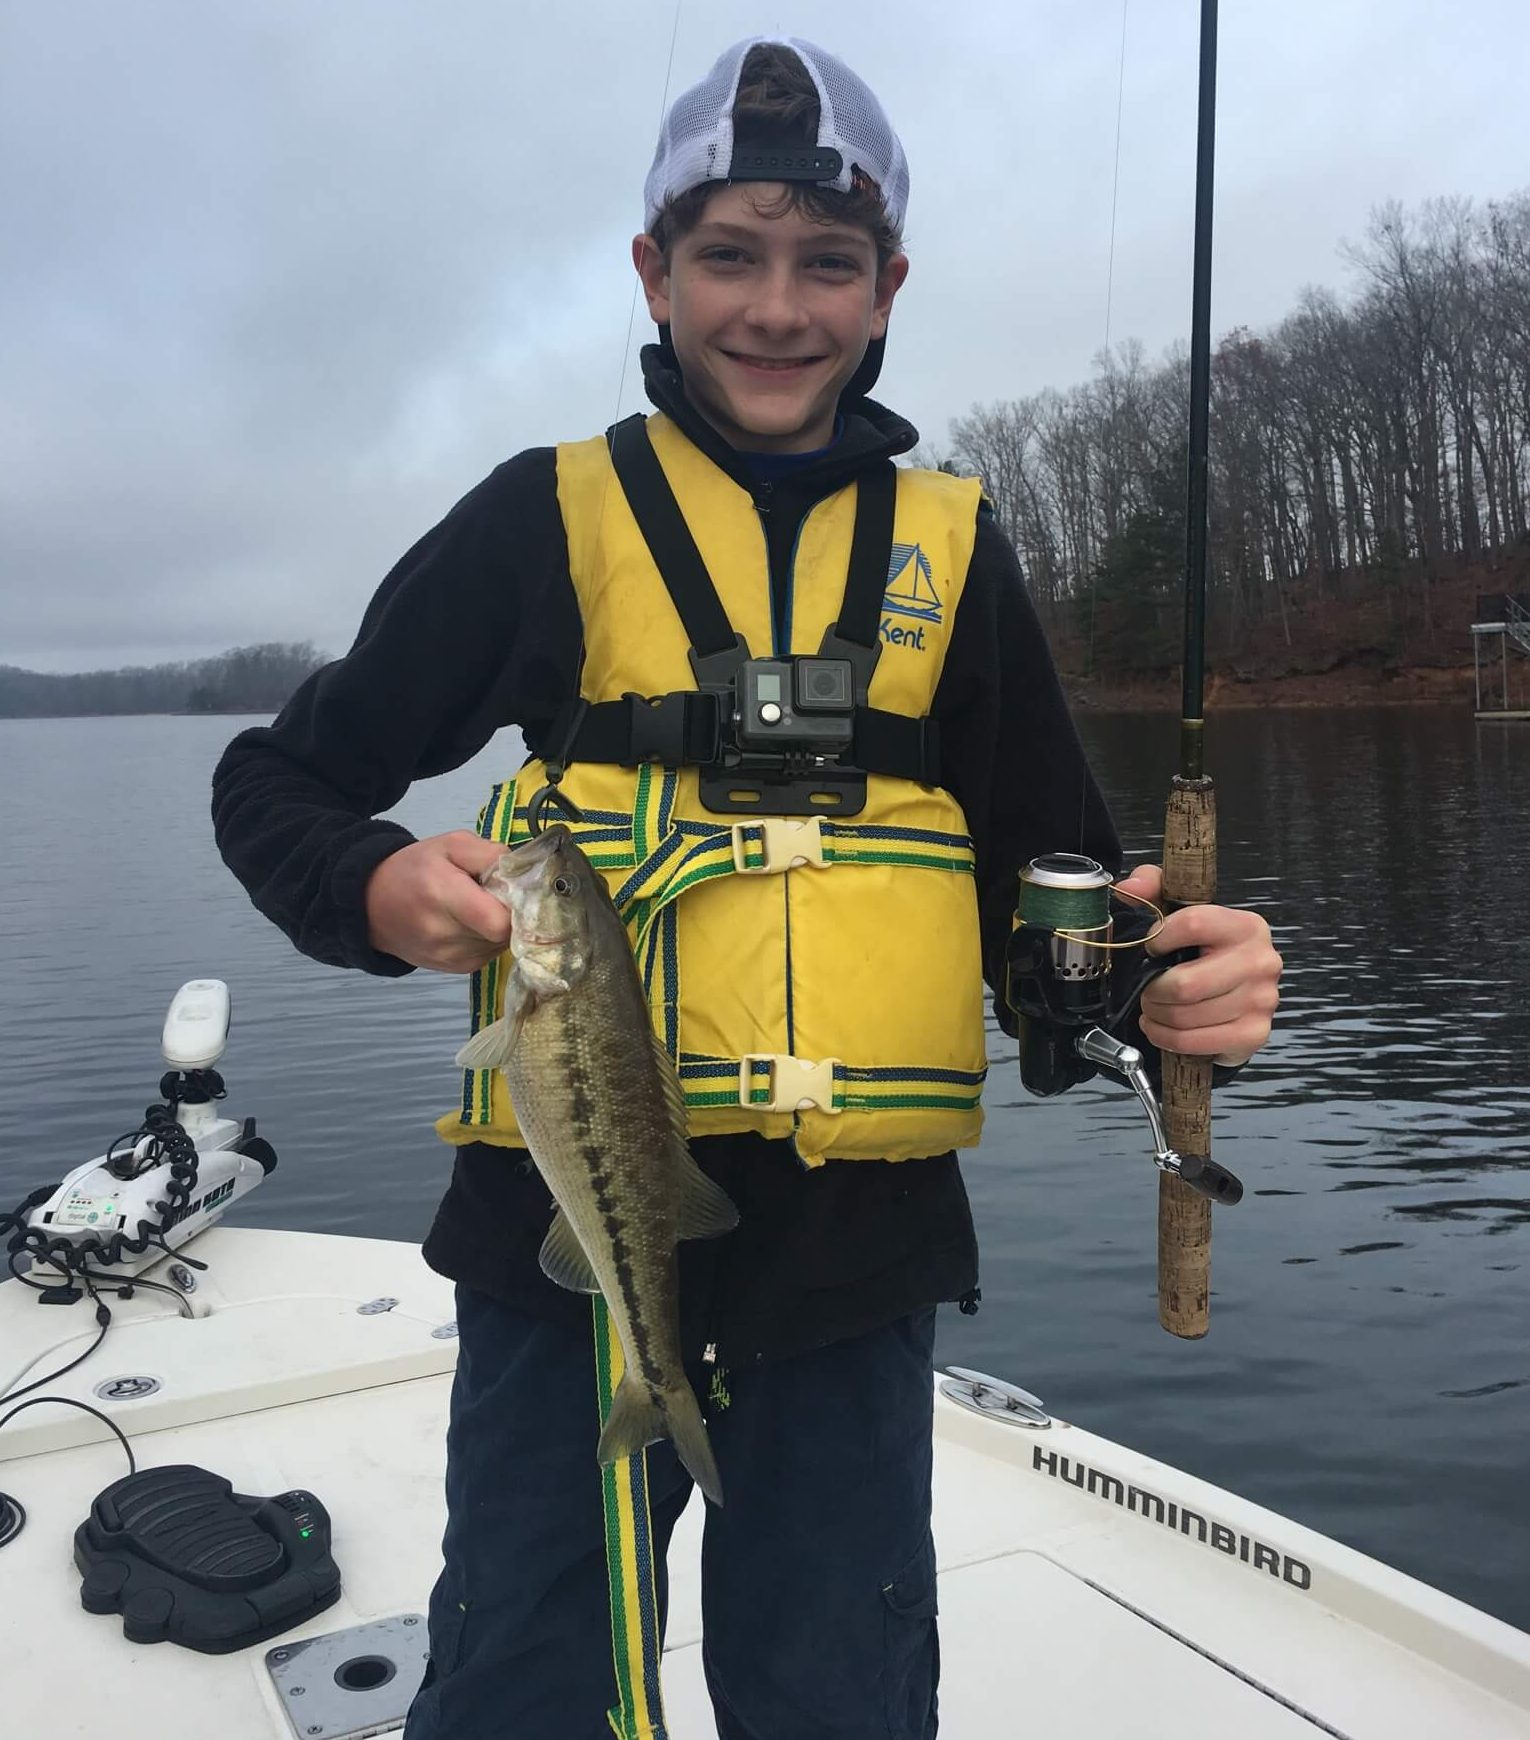 Lake lanier fishing report february 23 2018 captain mack 39 s for Fishing report lake lanier